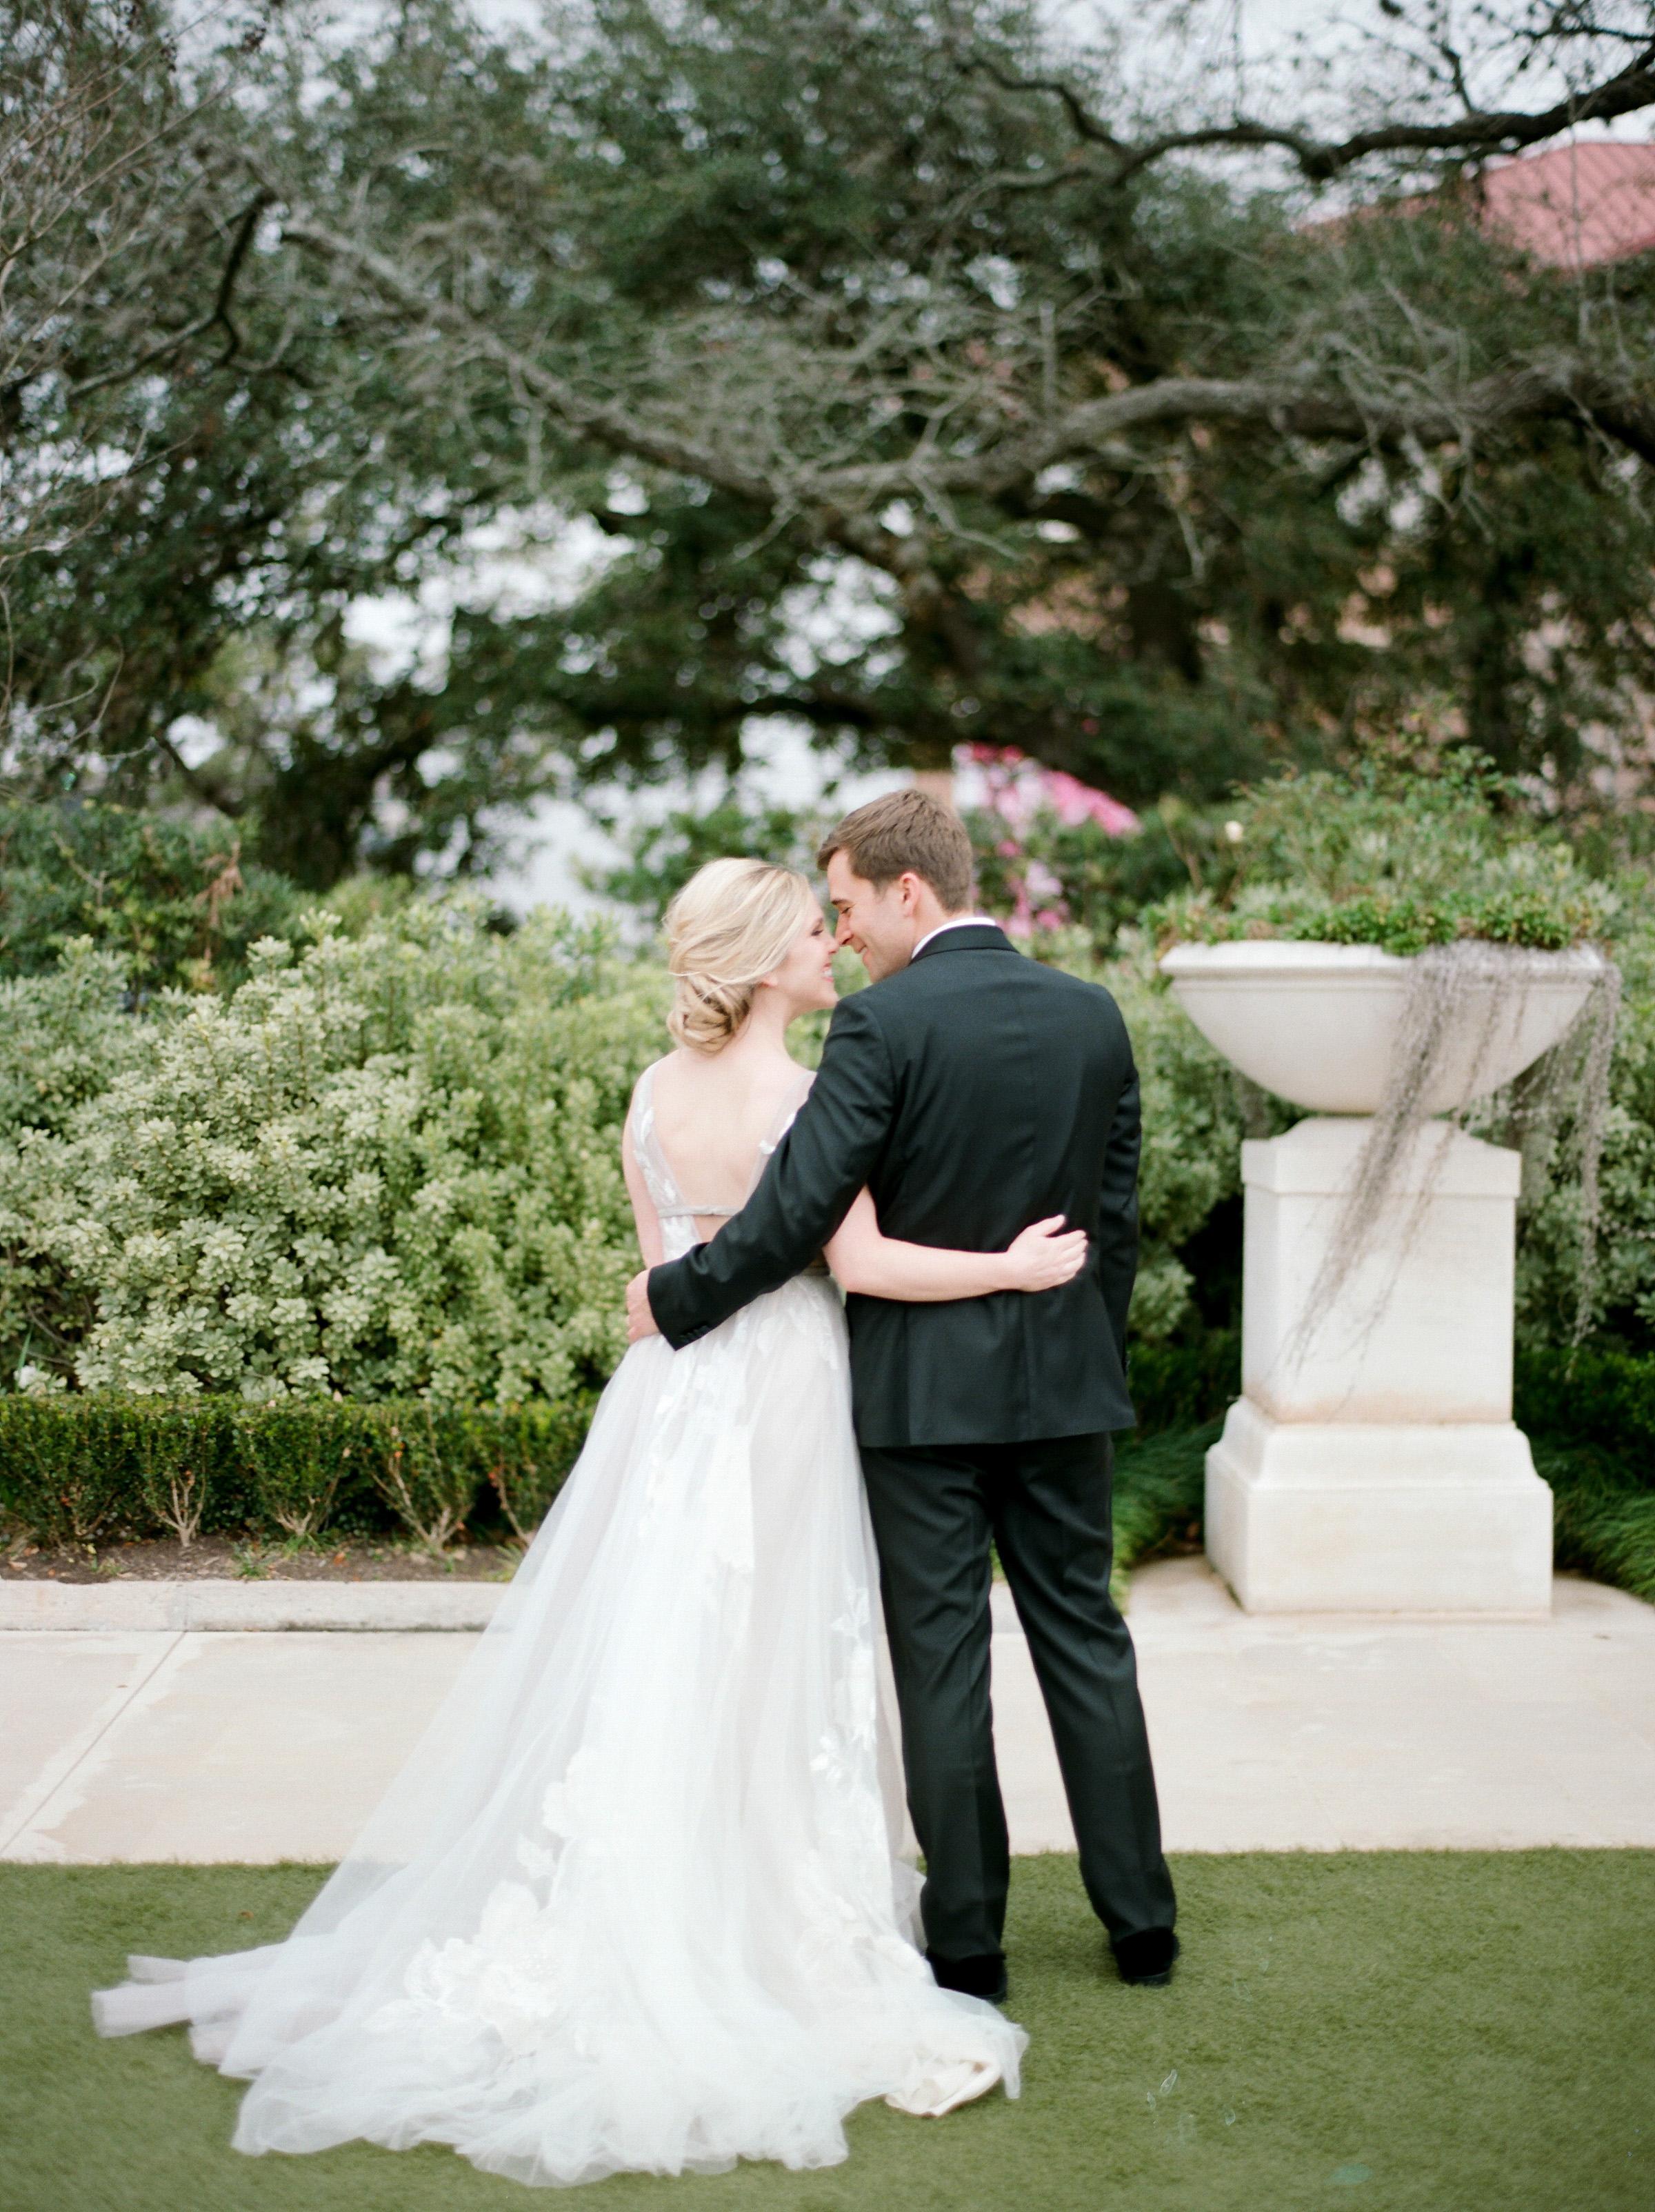 McGovern-Centennial-Gardens-Houston-Texas-Wedding-Venue-Josh-Dana-Fernandez-Photography-Film-Destination-Fine-Art-Luxury-Top-Best-Austin-Dallas-Magnolia-Rouge-Jennifer-Laura-Design-6.jpg